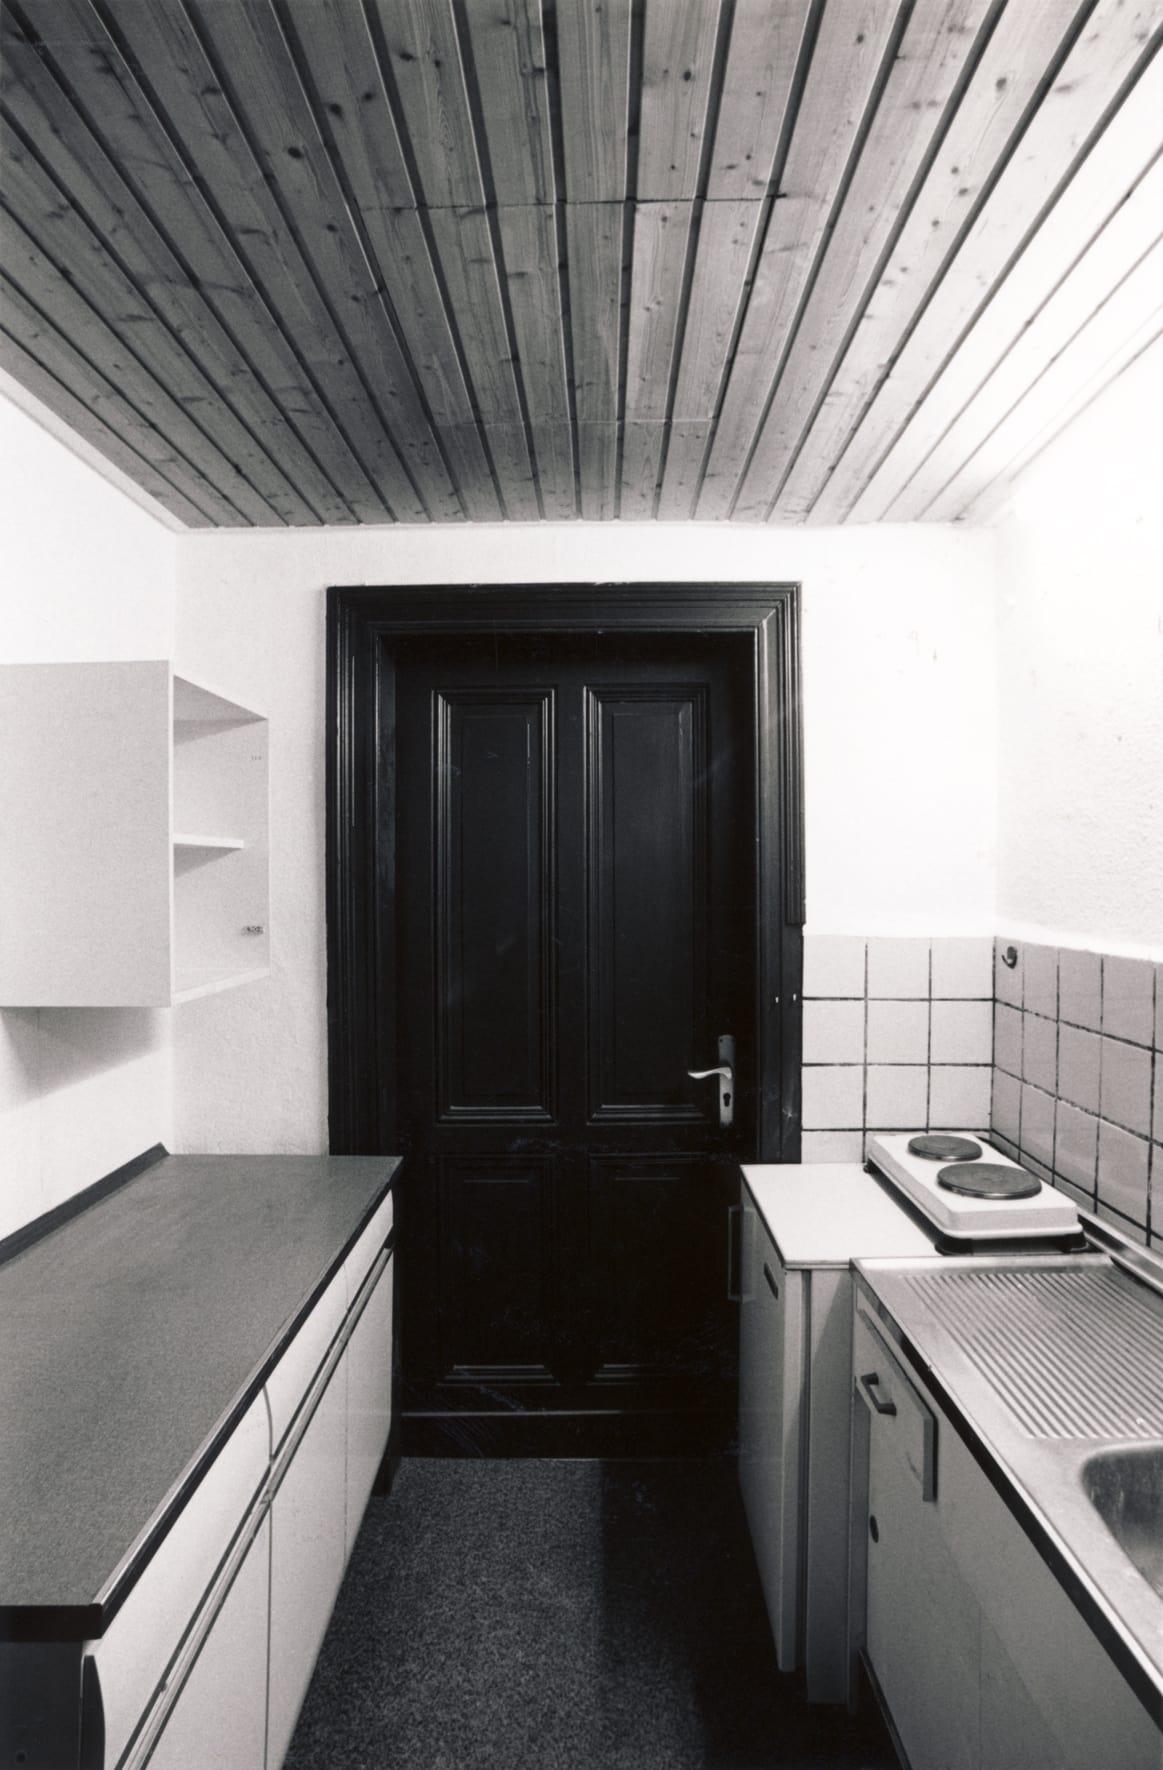 1987 haus ur rheydt 07 dominik mersch gallery. Black Bedroom Furniture Sets. Home Design Ideas